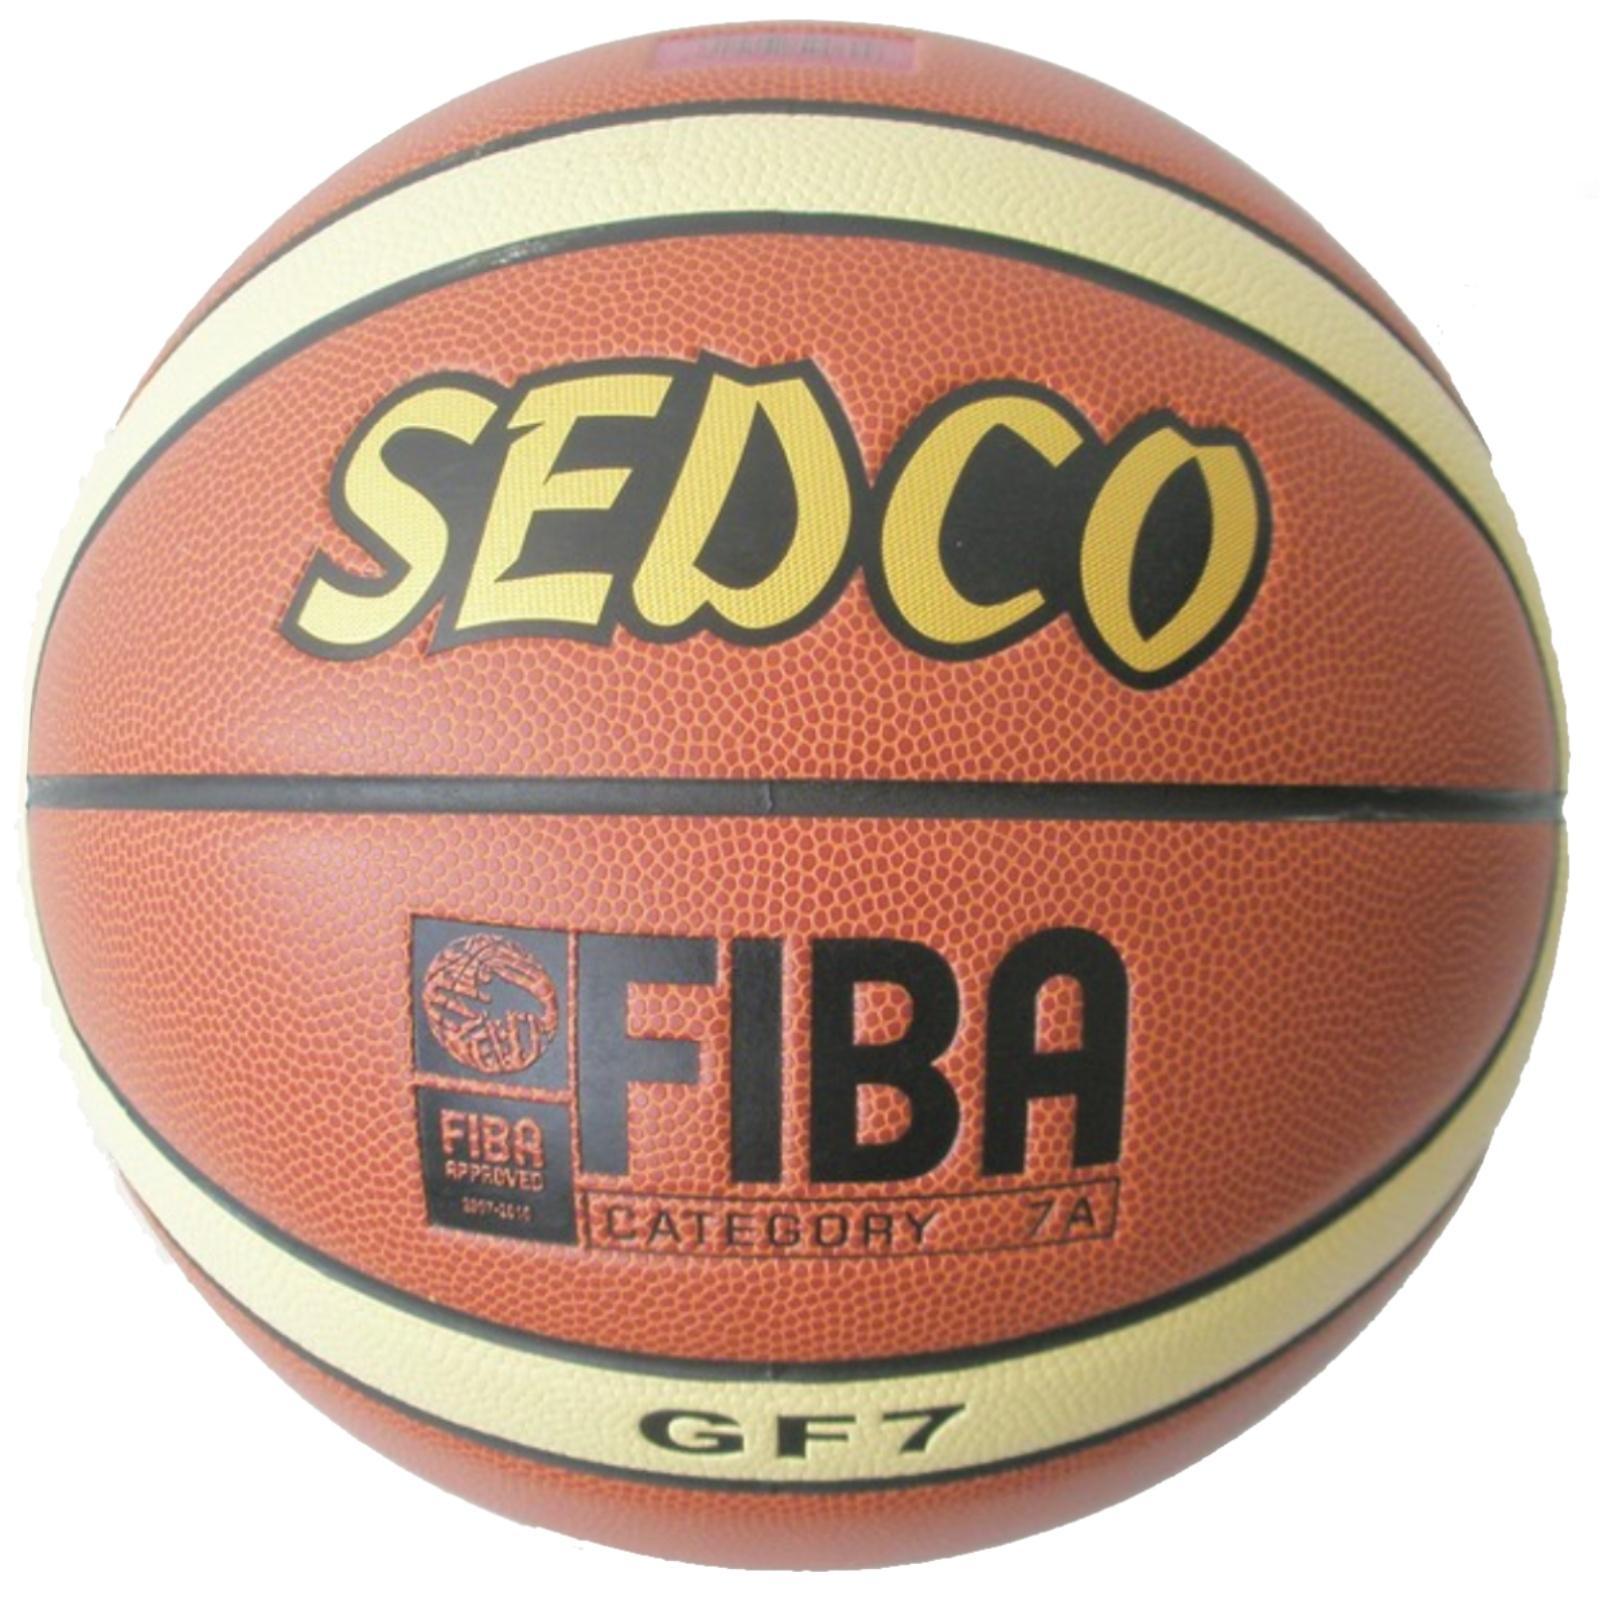 Basketbalový míč SEDCO Category GF 7